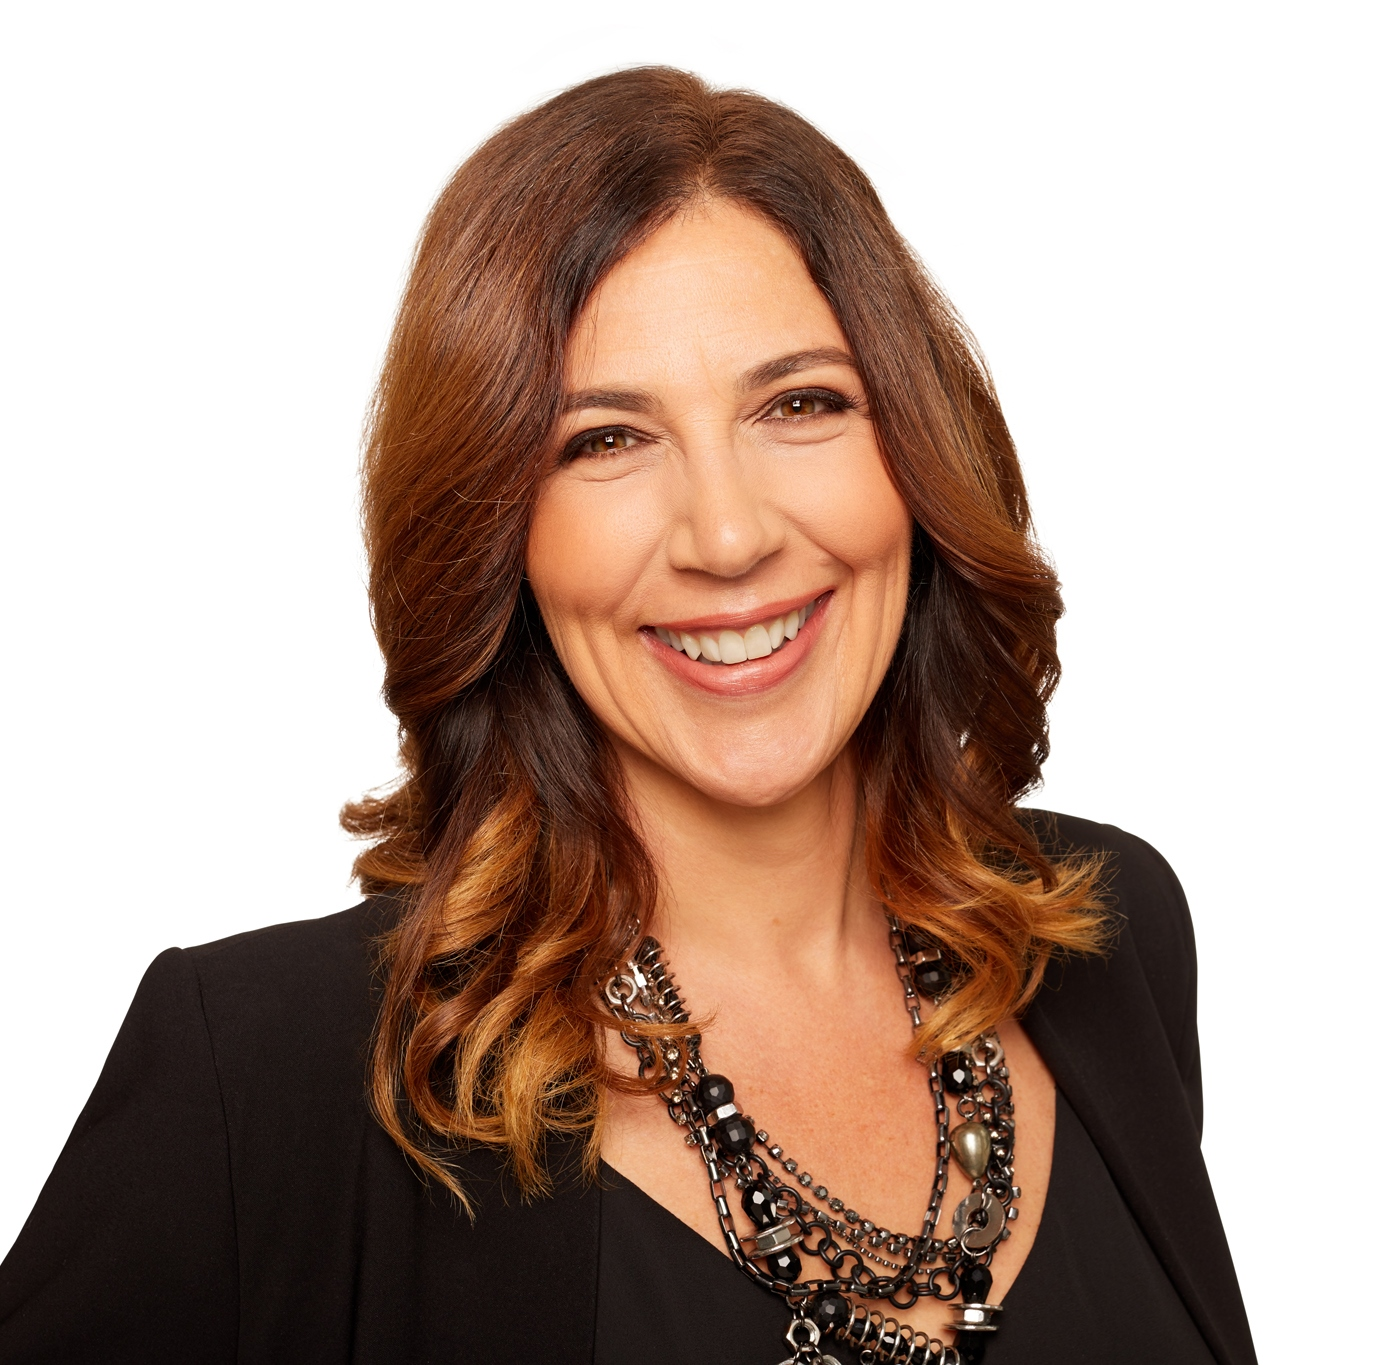 Rachel Main